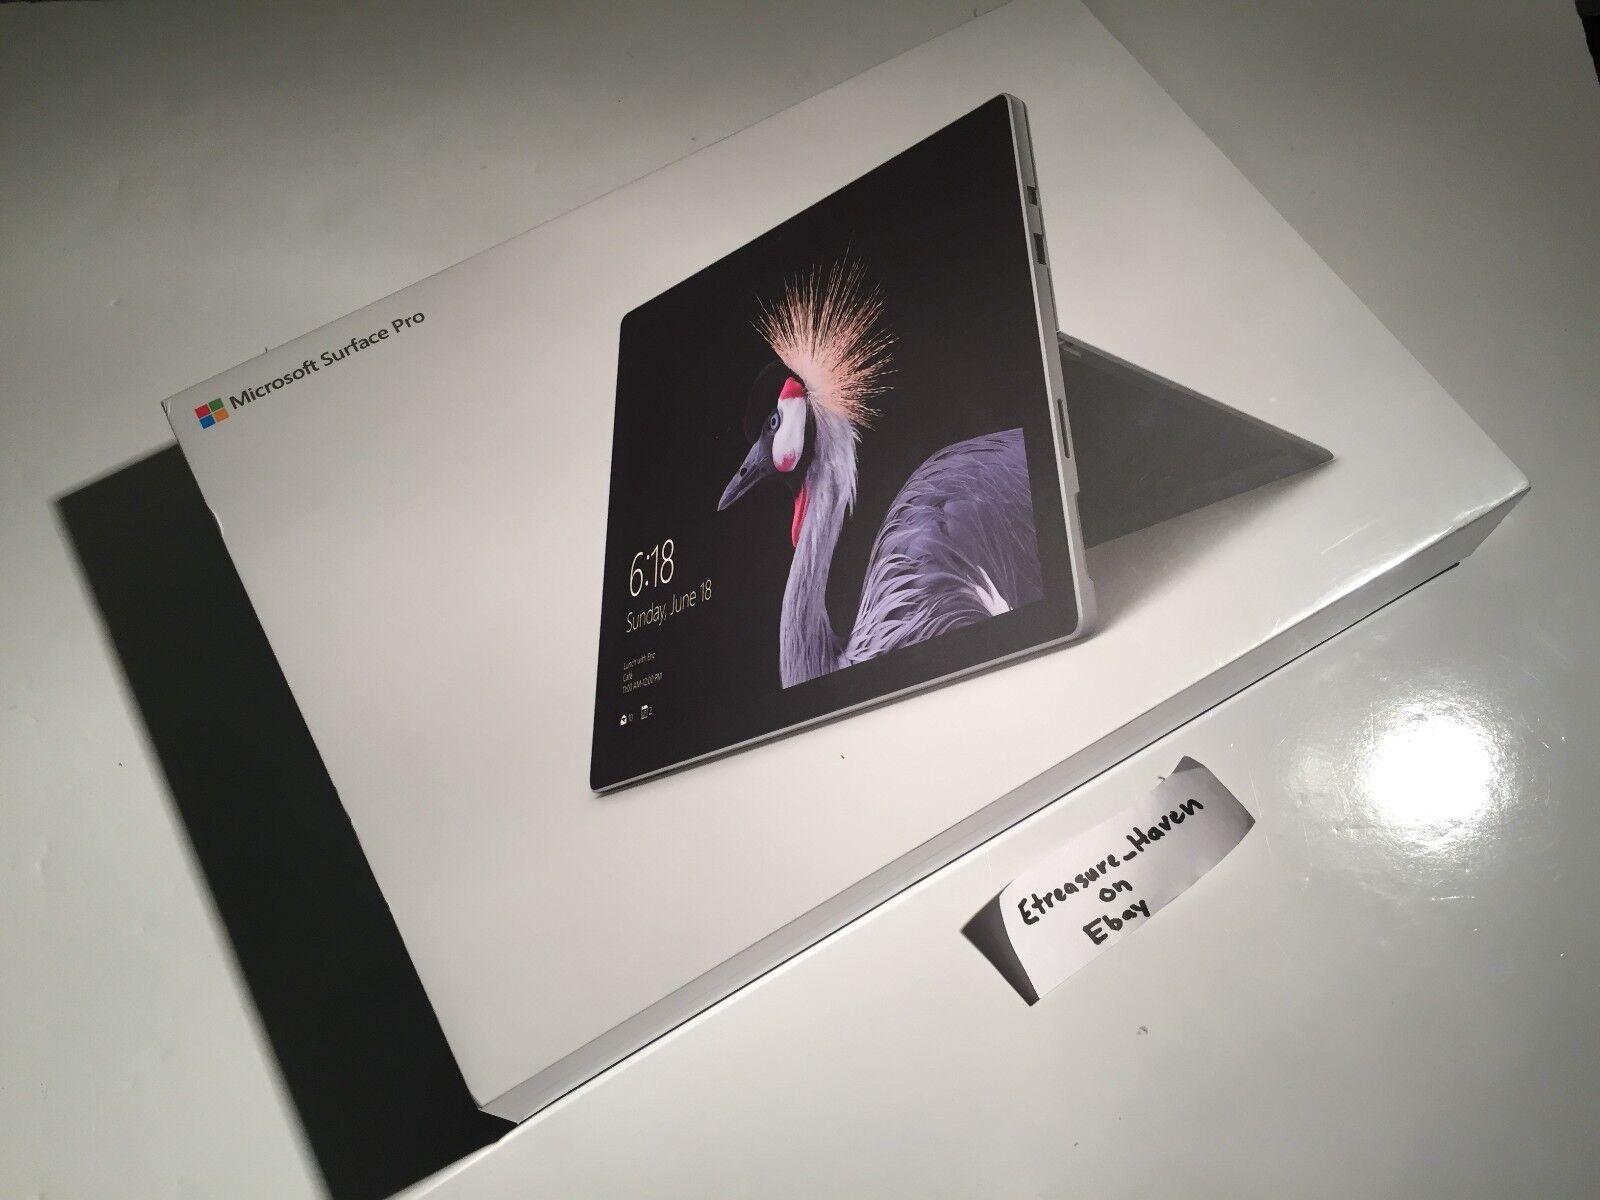 Microsoft Surface Pro i5 128GB 4GB Go Ram Model 1796 Tablet NEW SEALED